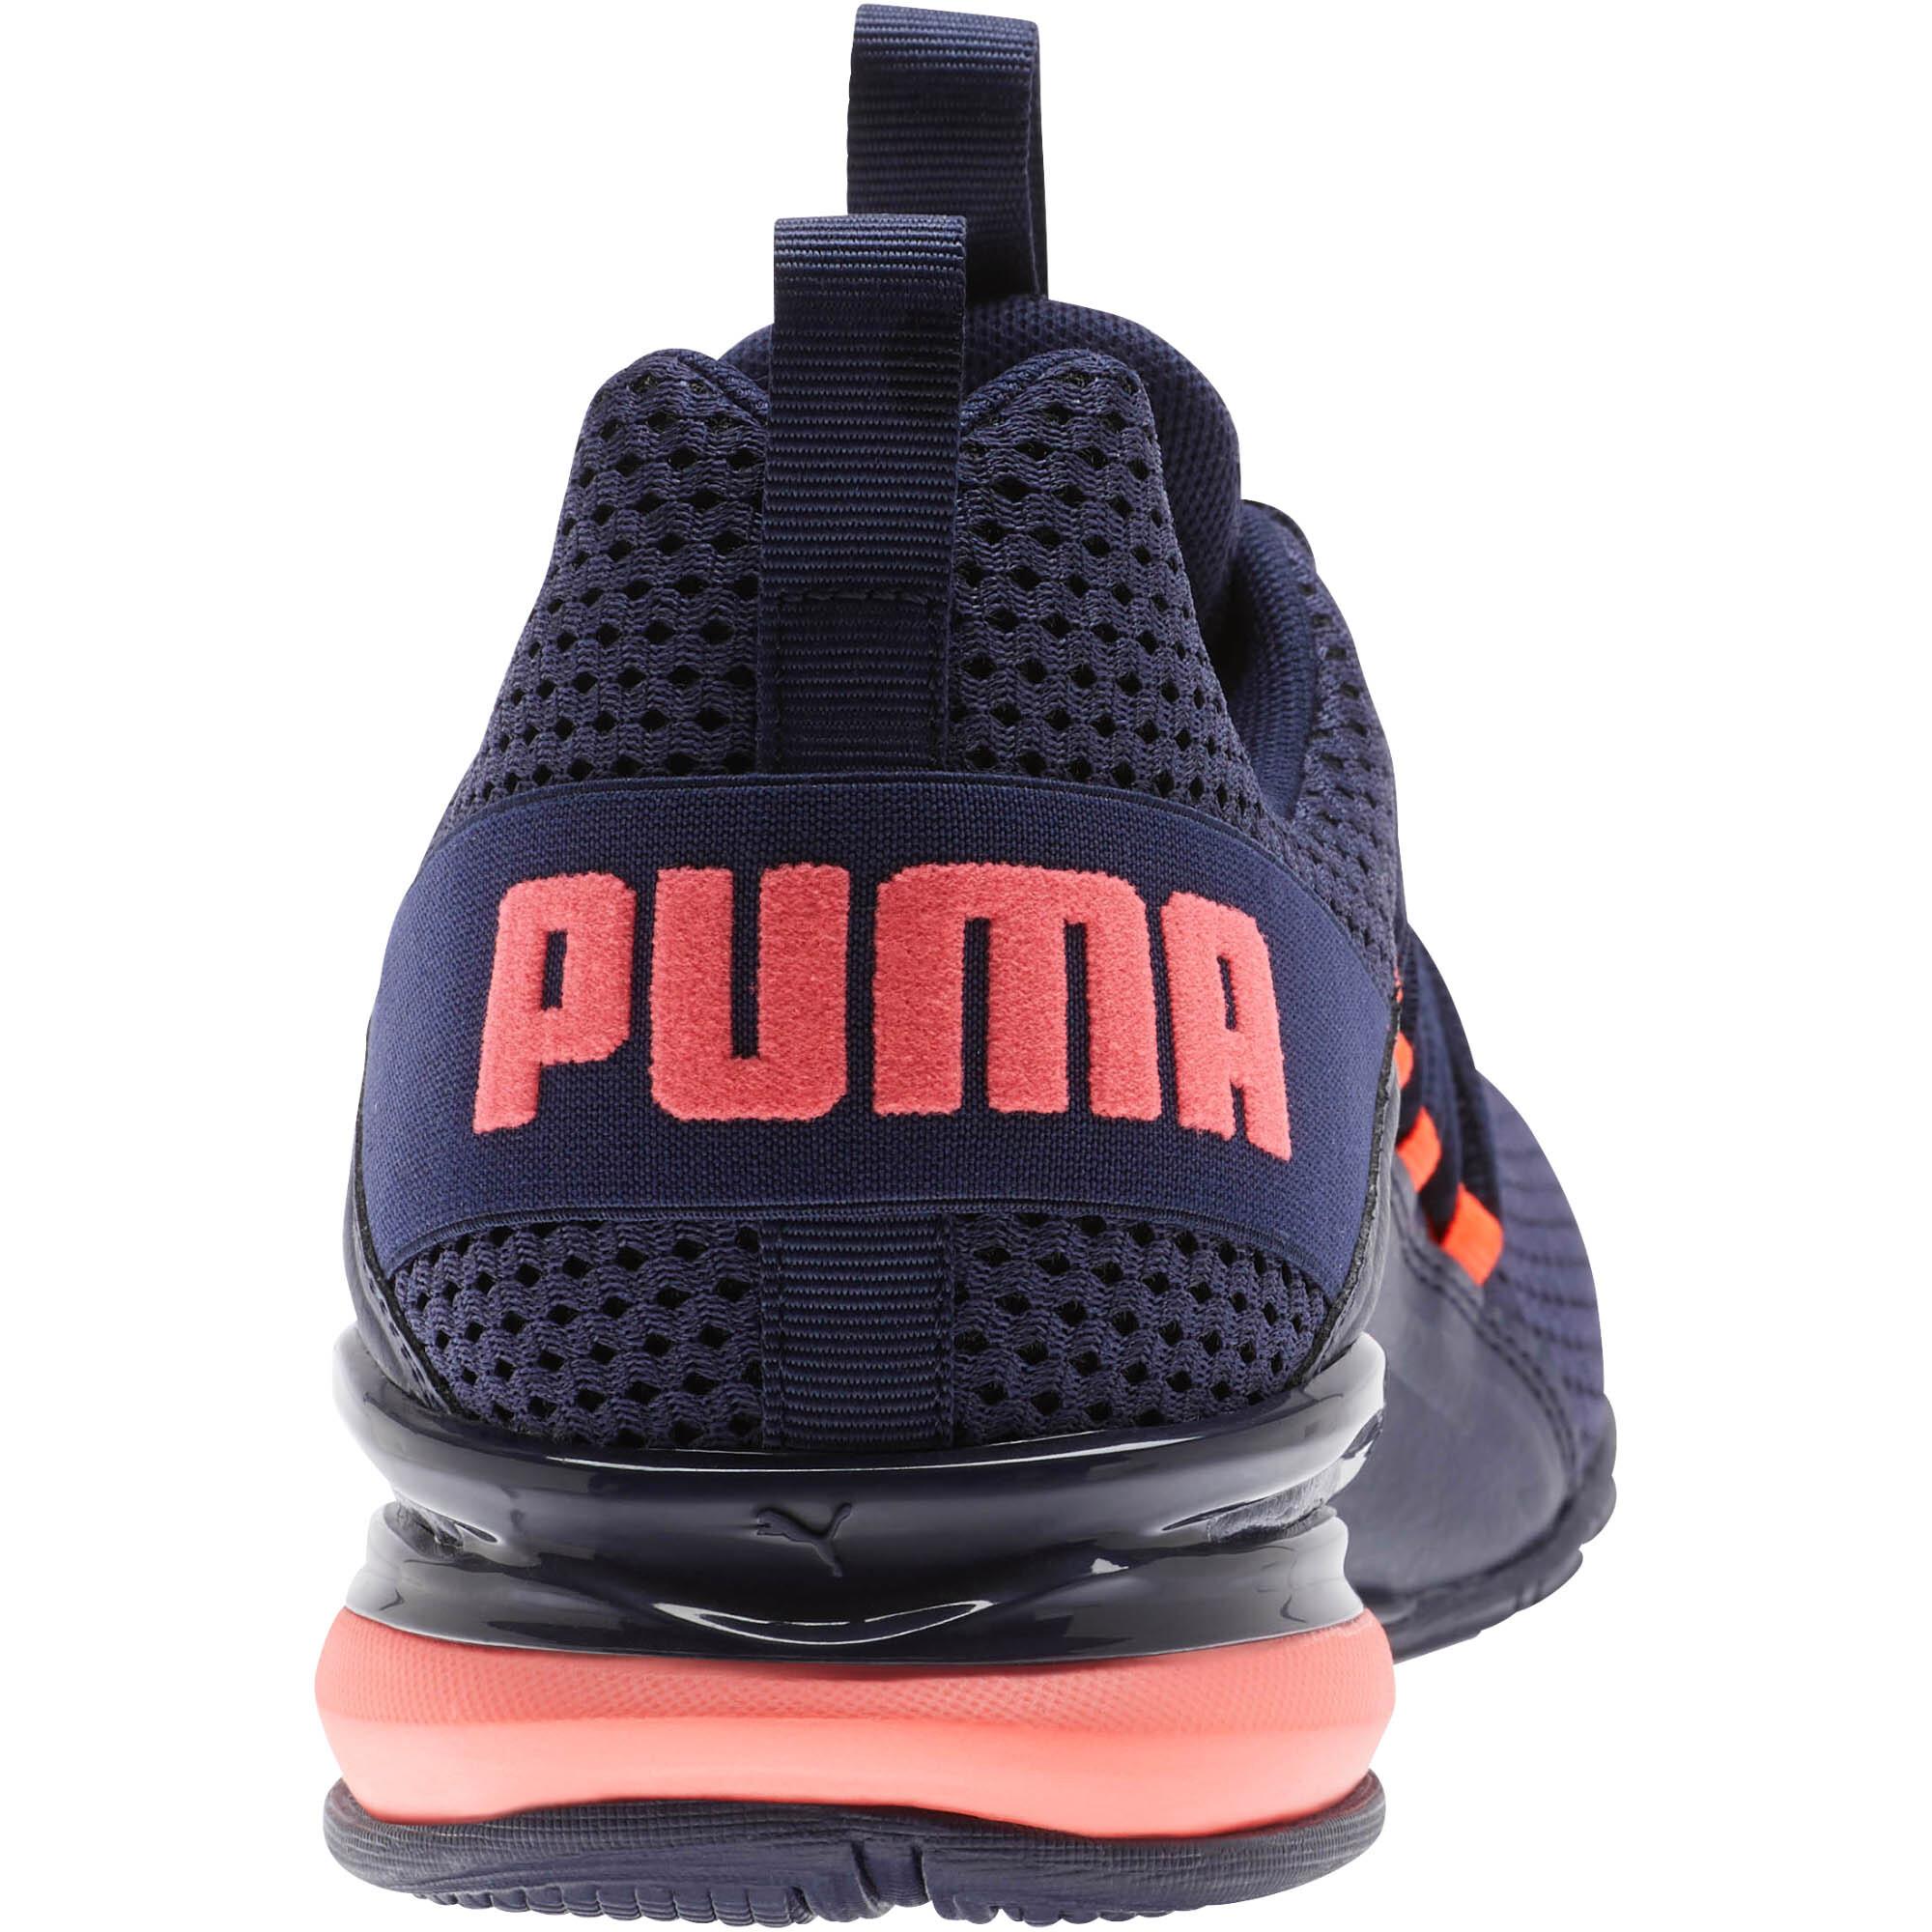 PUMA-Axelion-Breathe-Men-s-Training-Shoes-Men-Shoe-Running thumbnail 3